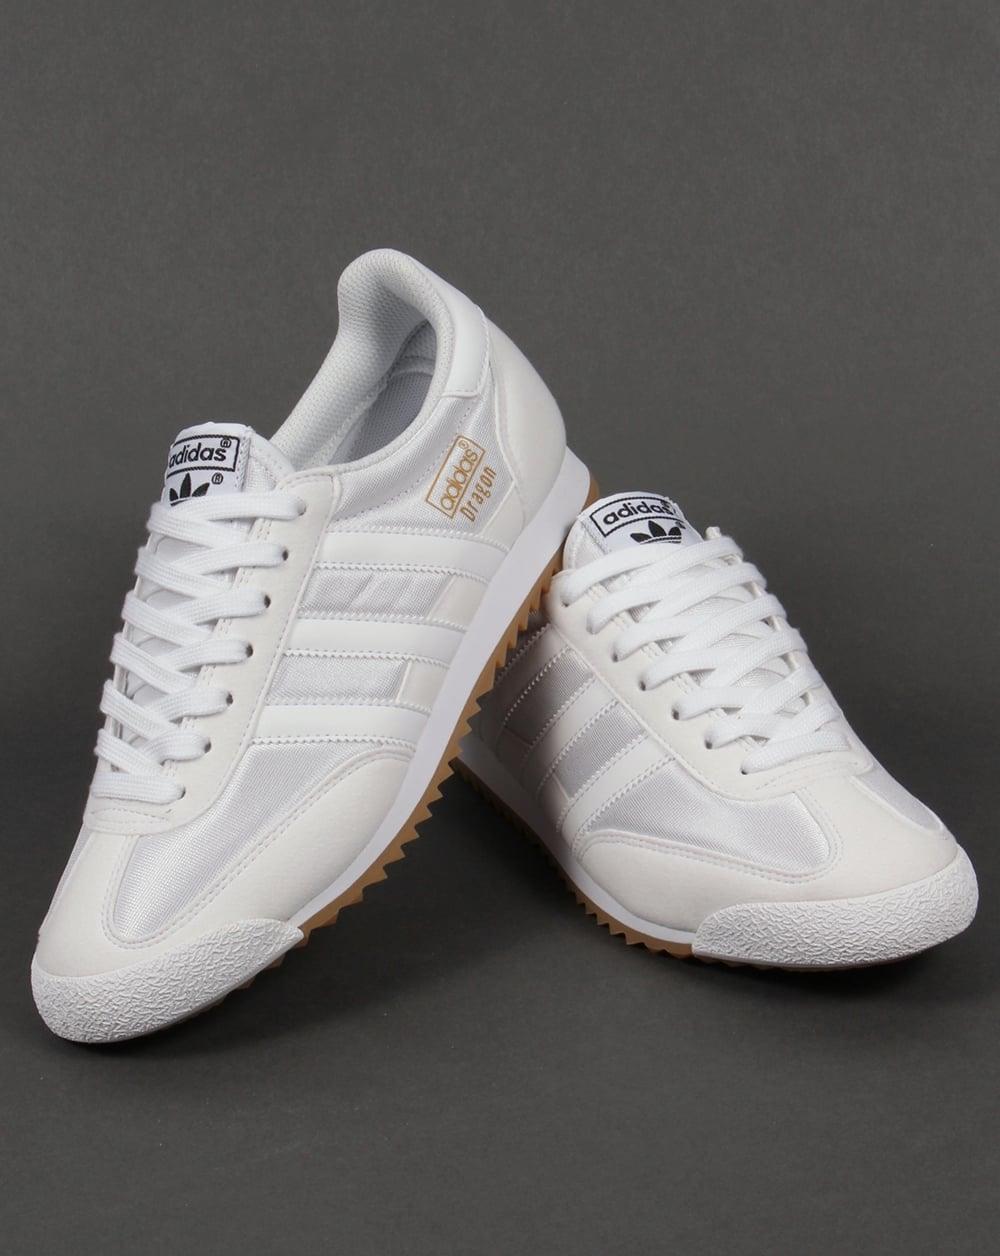 Adidas Dragon Trainers White Whiteoriginalsretrorunners